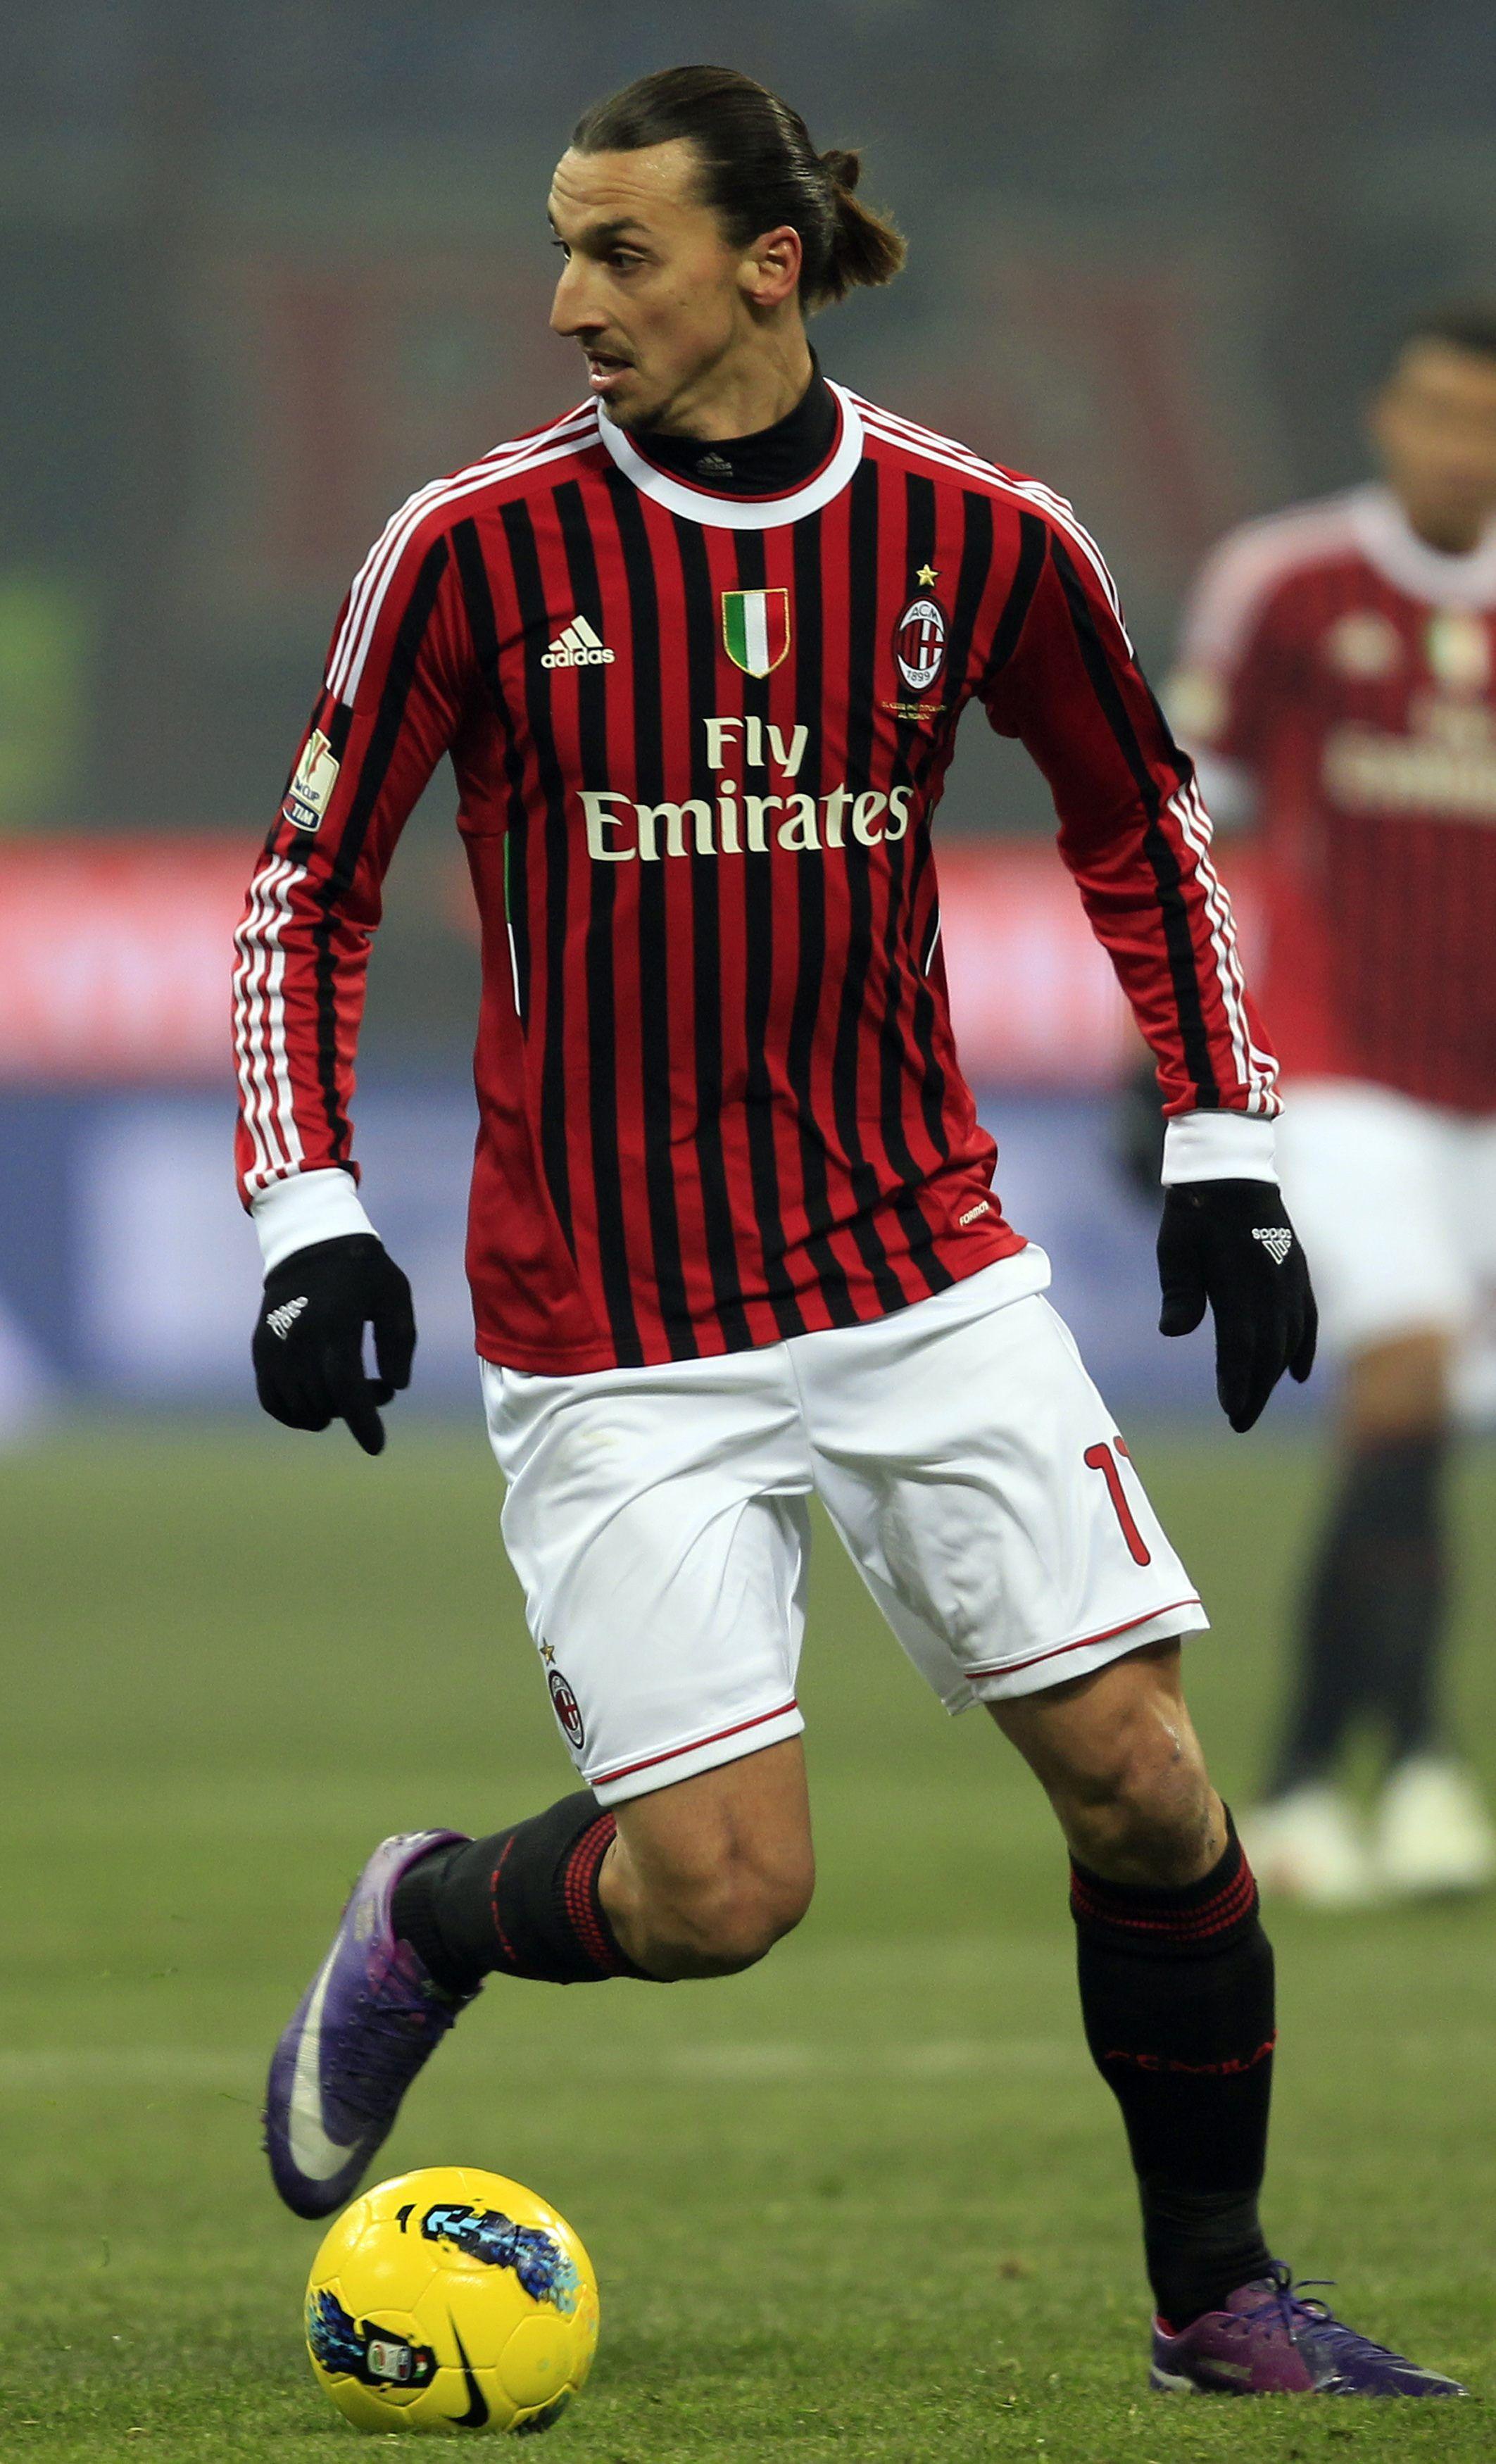 Zlatan Ibrahimovic AC Milan classicfootballshirts.co